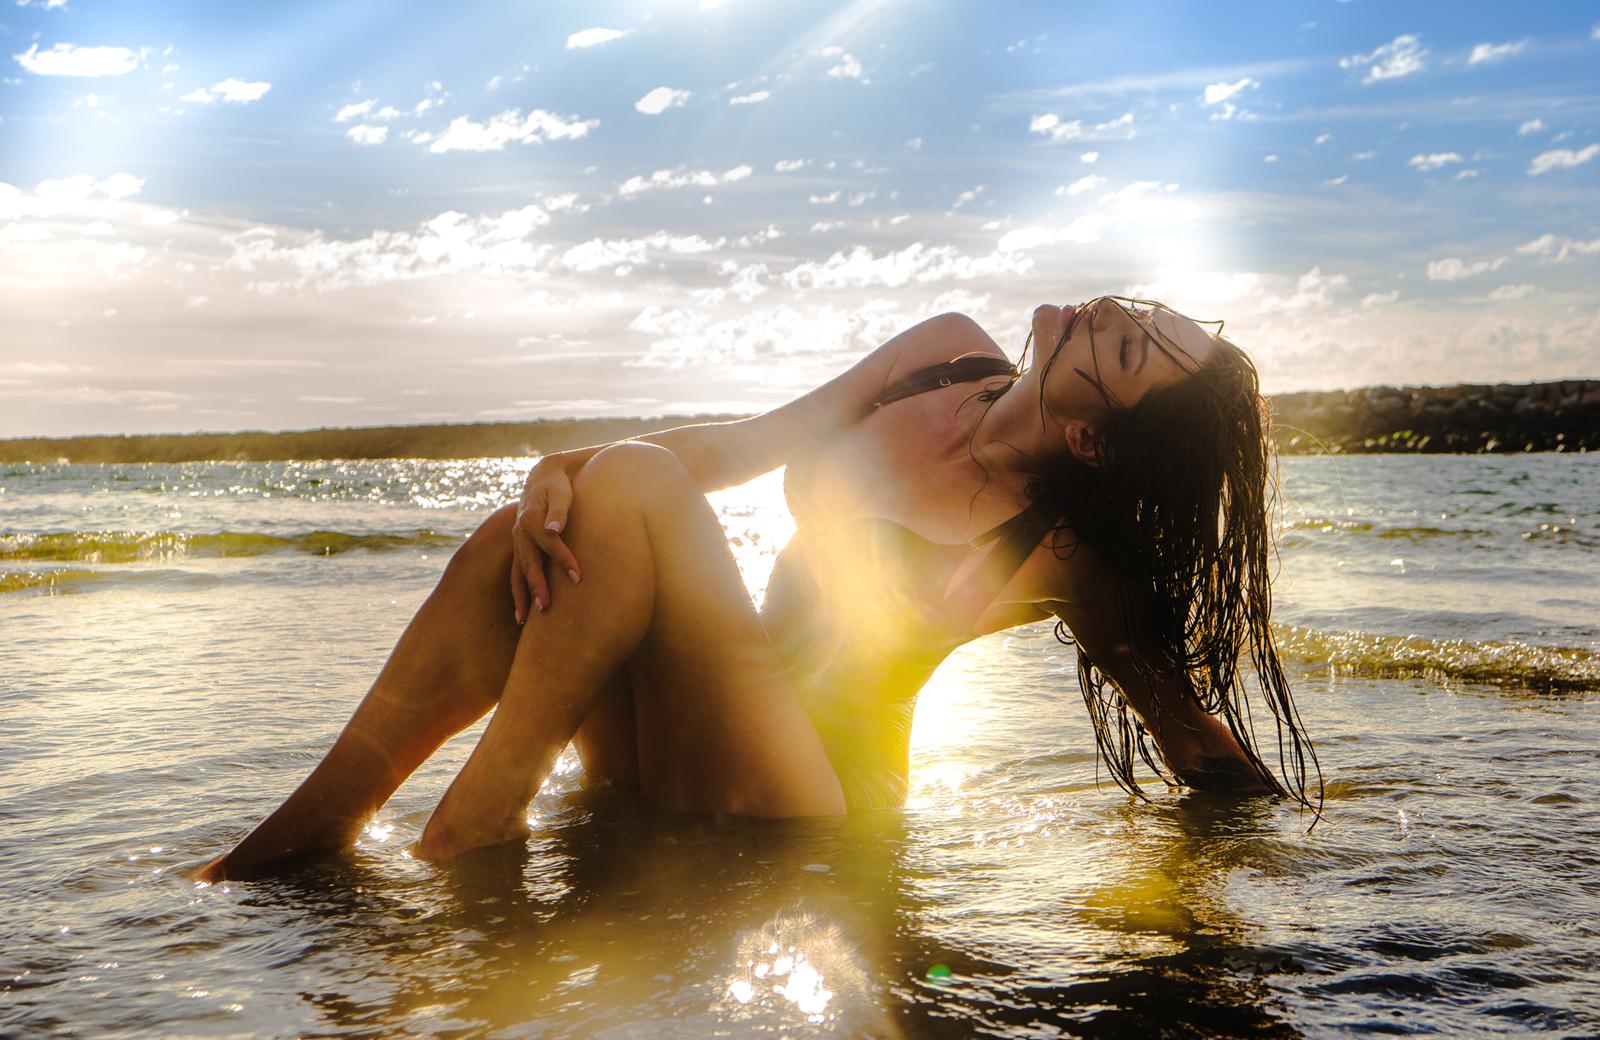 DENNY GLOW Photographers  fashion   // lionsmag.com - premium nude photography magazine